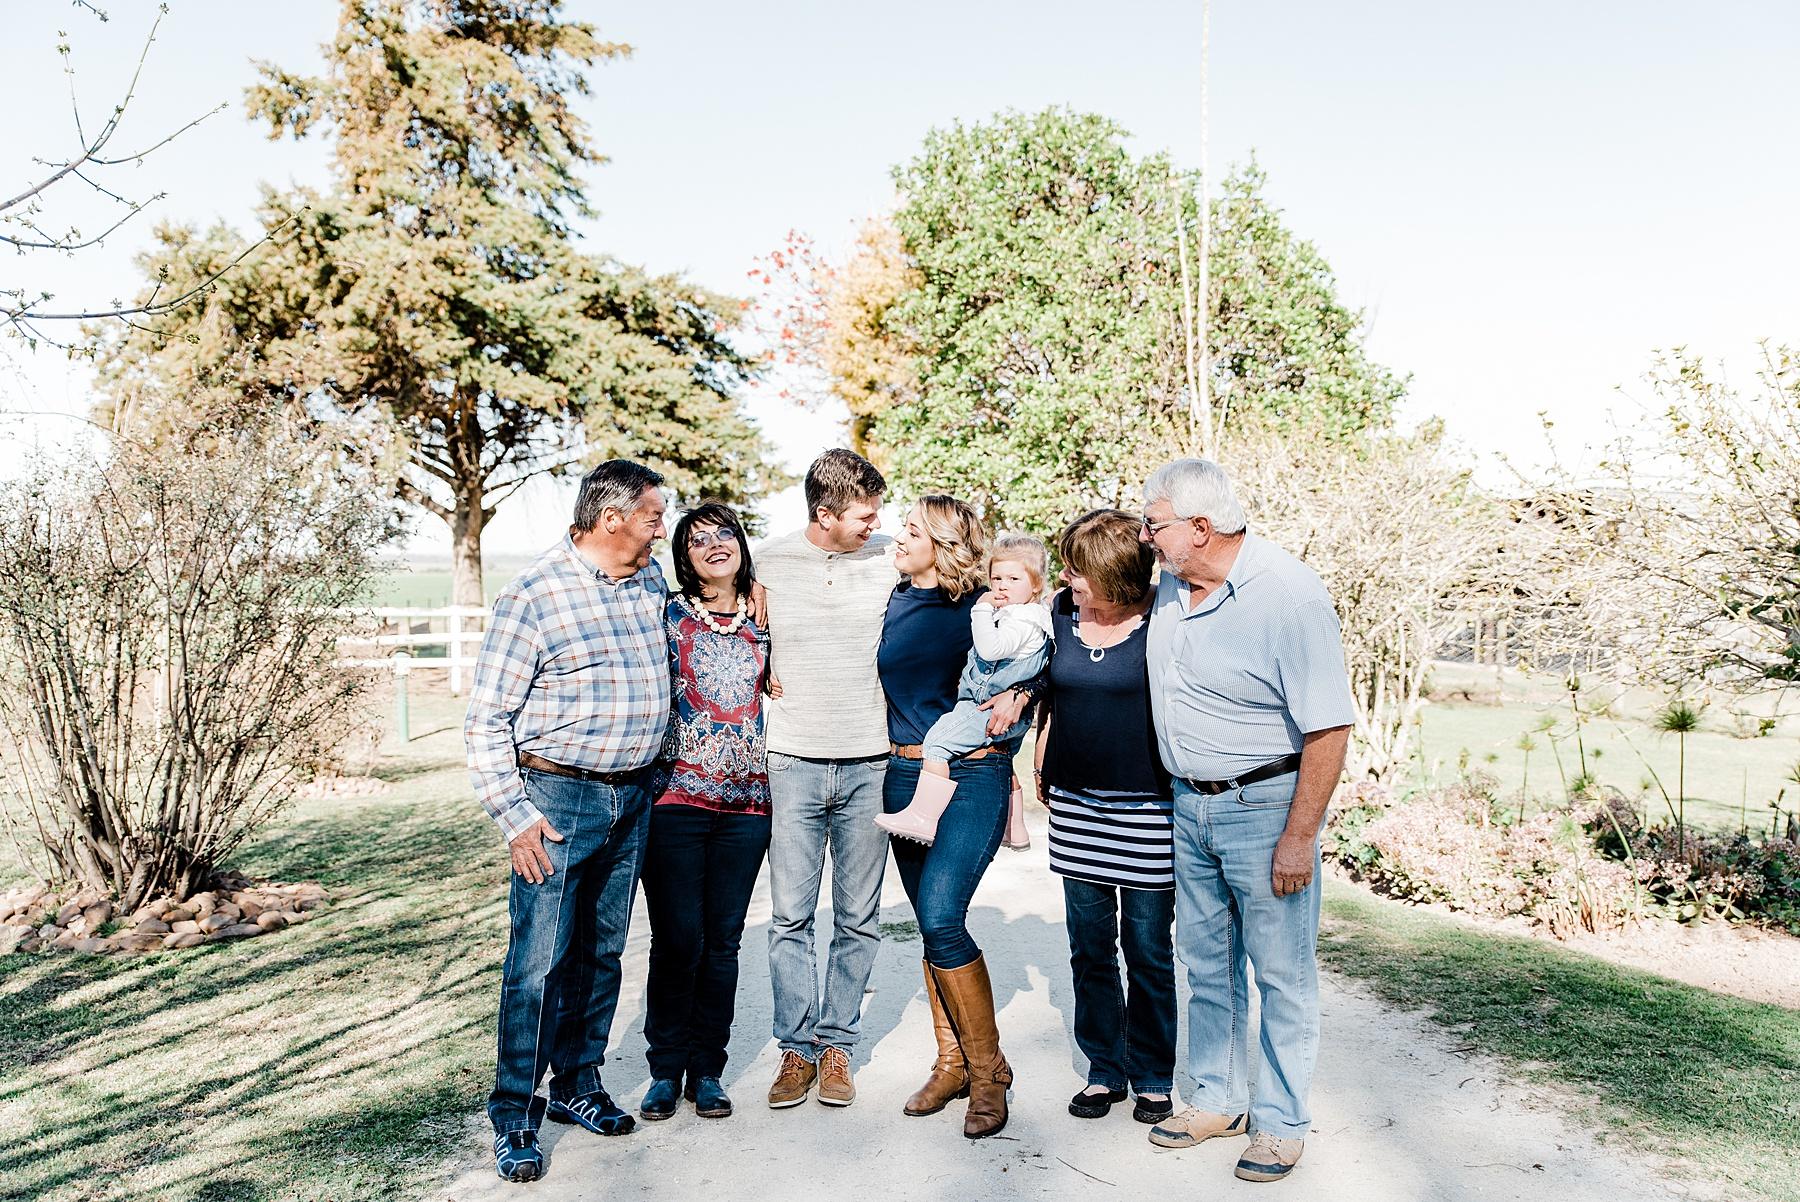 Theron & Co Family